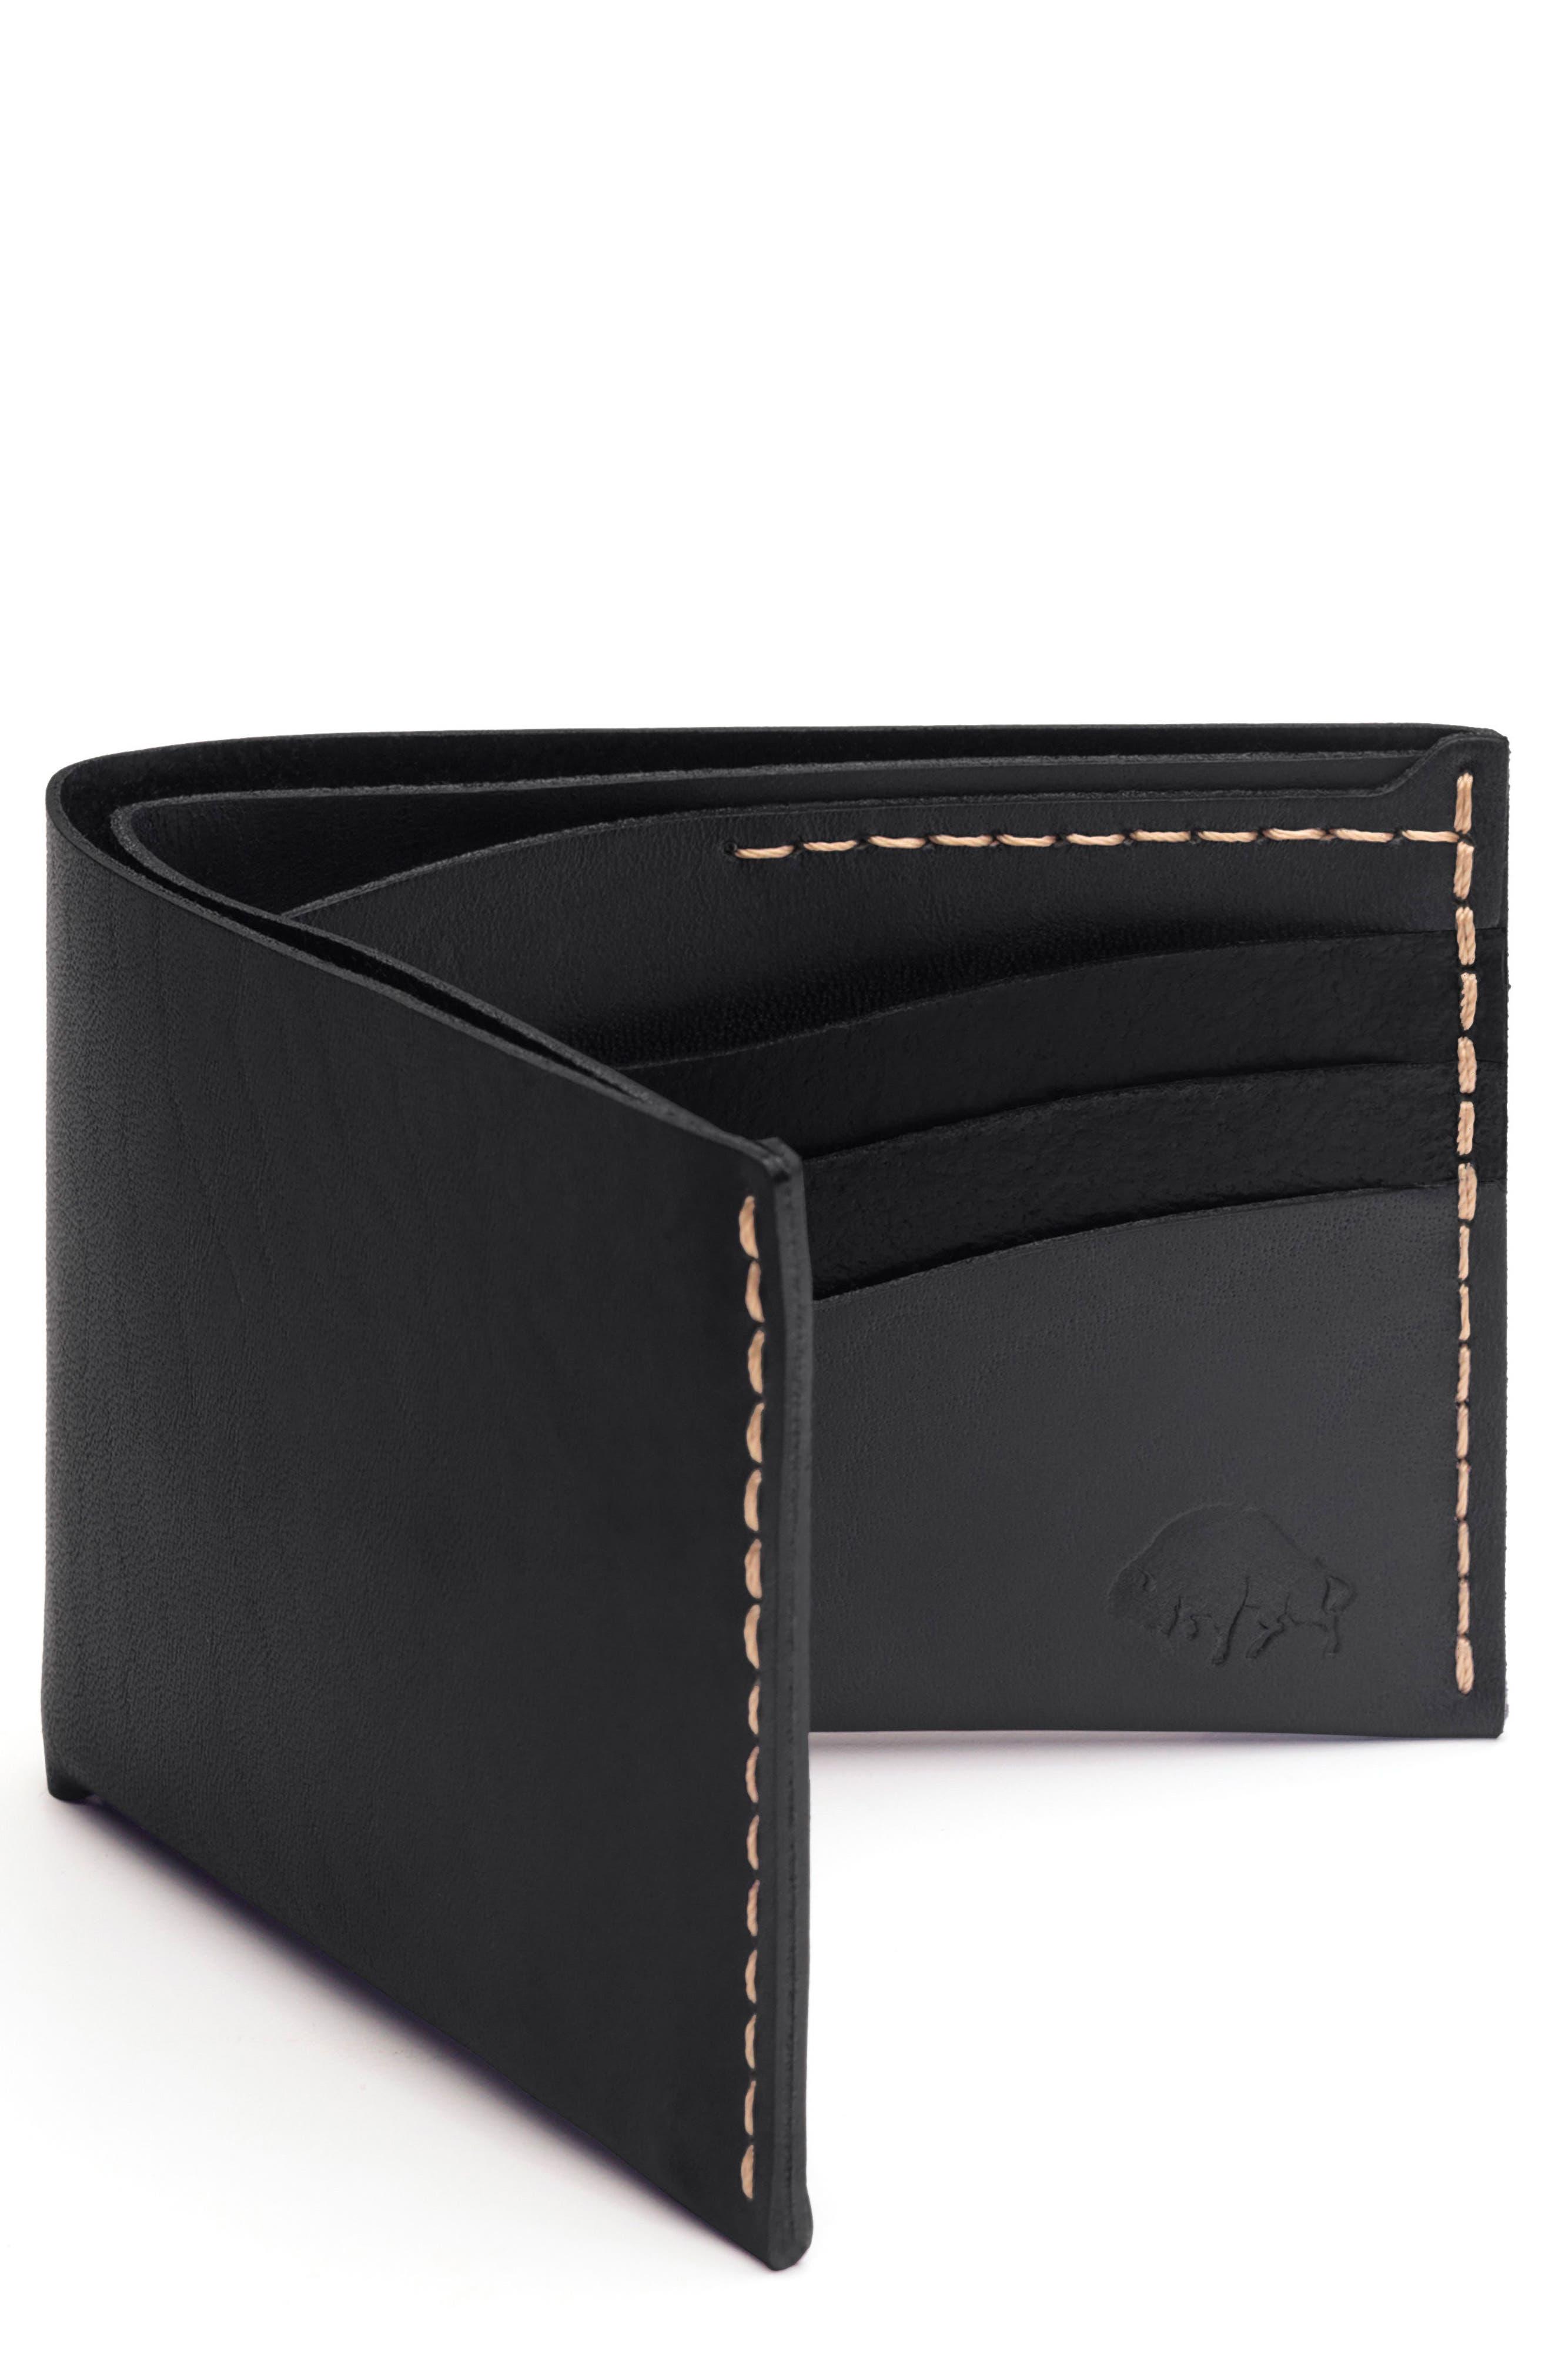 Main Image - Ezra Arthur No. 8 Leather Wallet